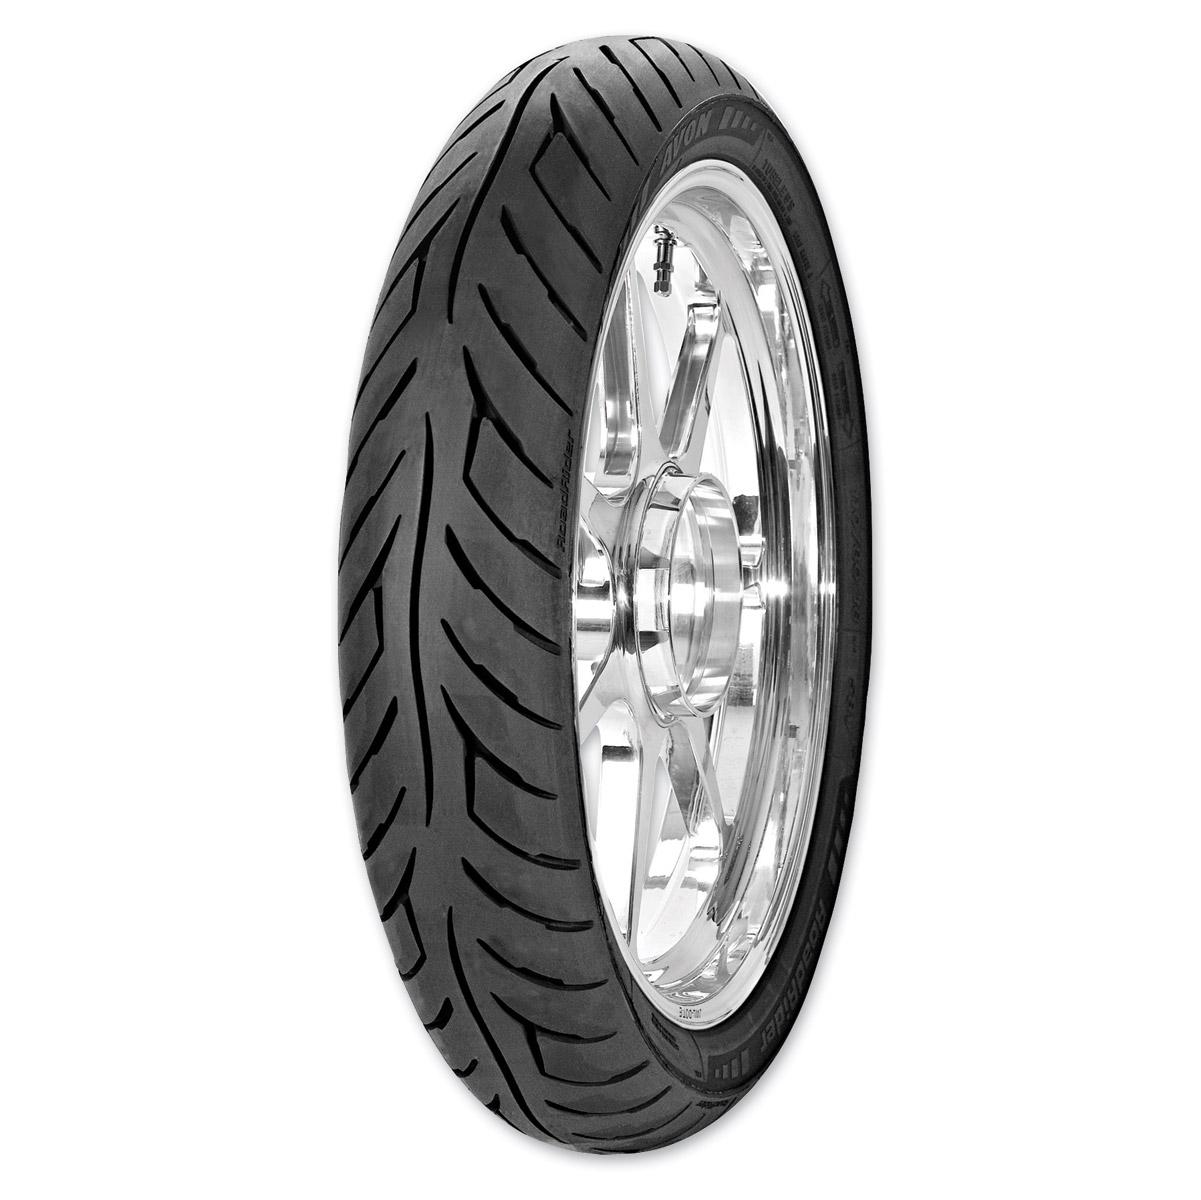 Avon AM26 Roadrider 3.25-19 Front/Rear Tire